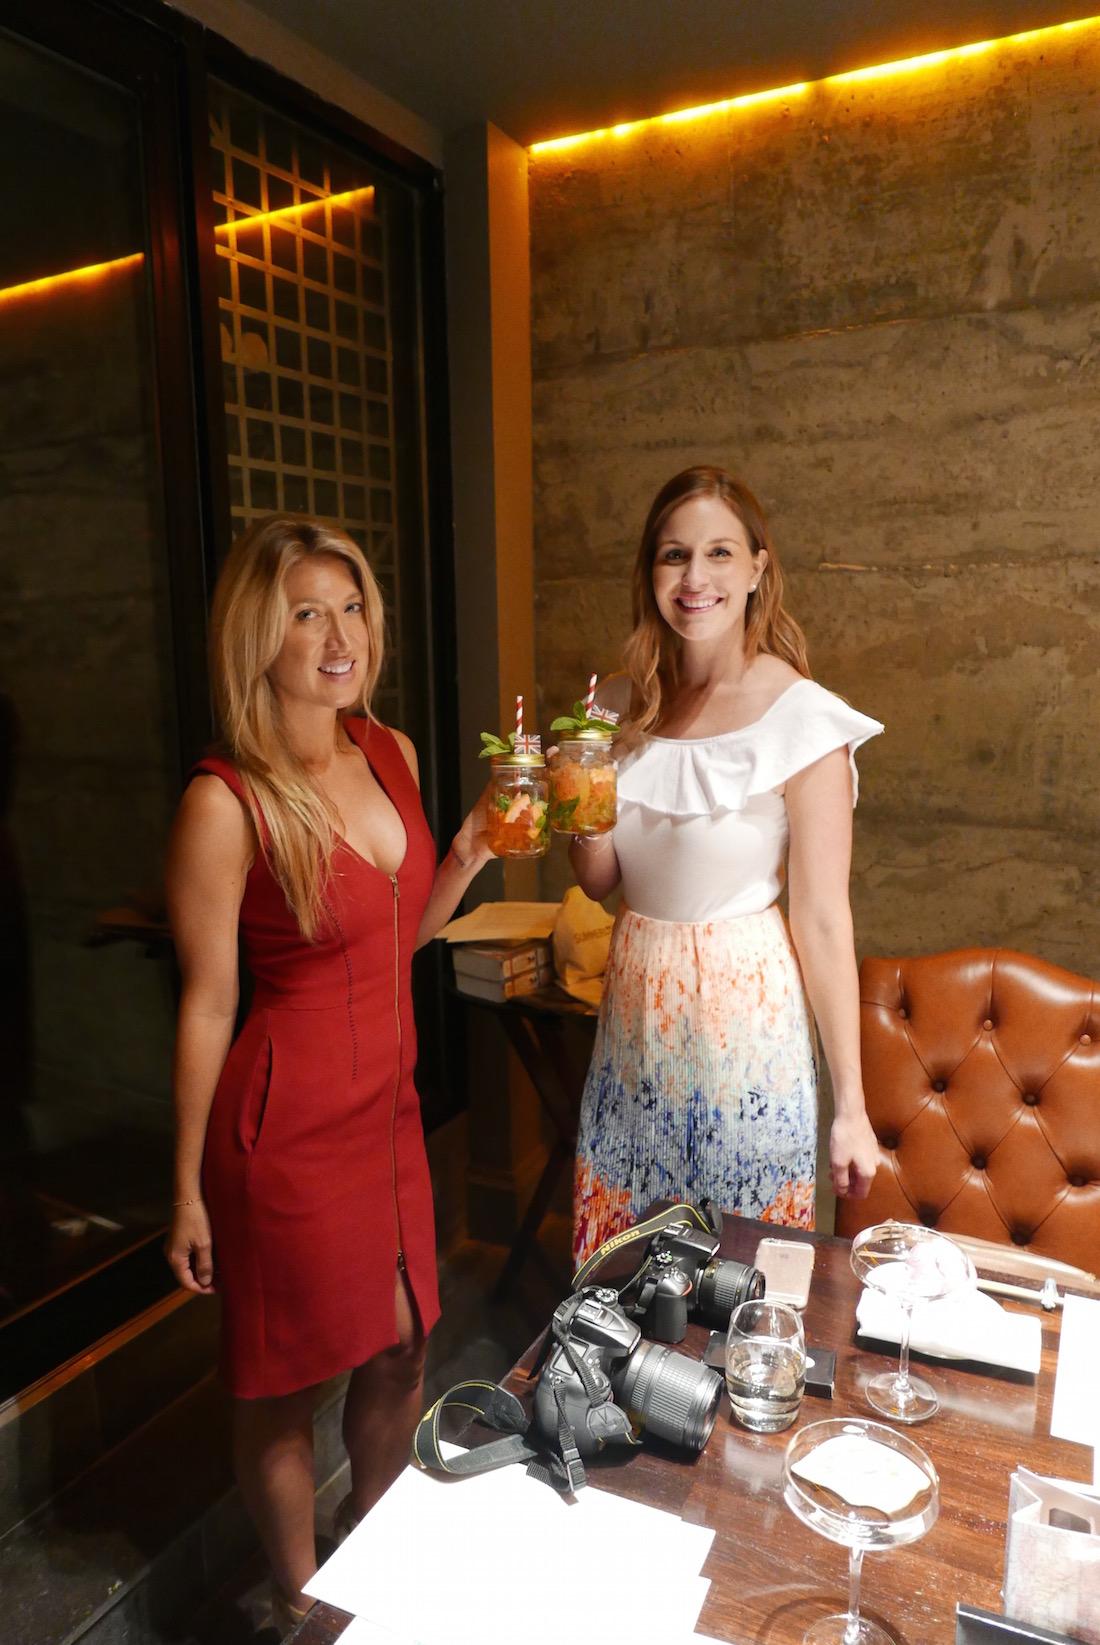 we-are-travel-girls-launch-event-yashin-ocean-london-20